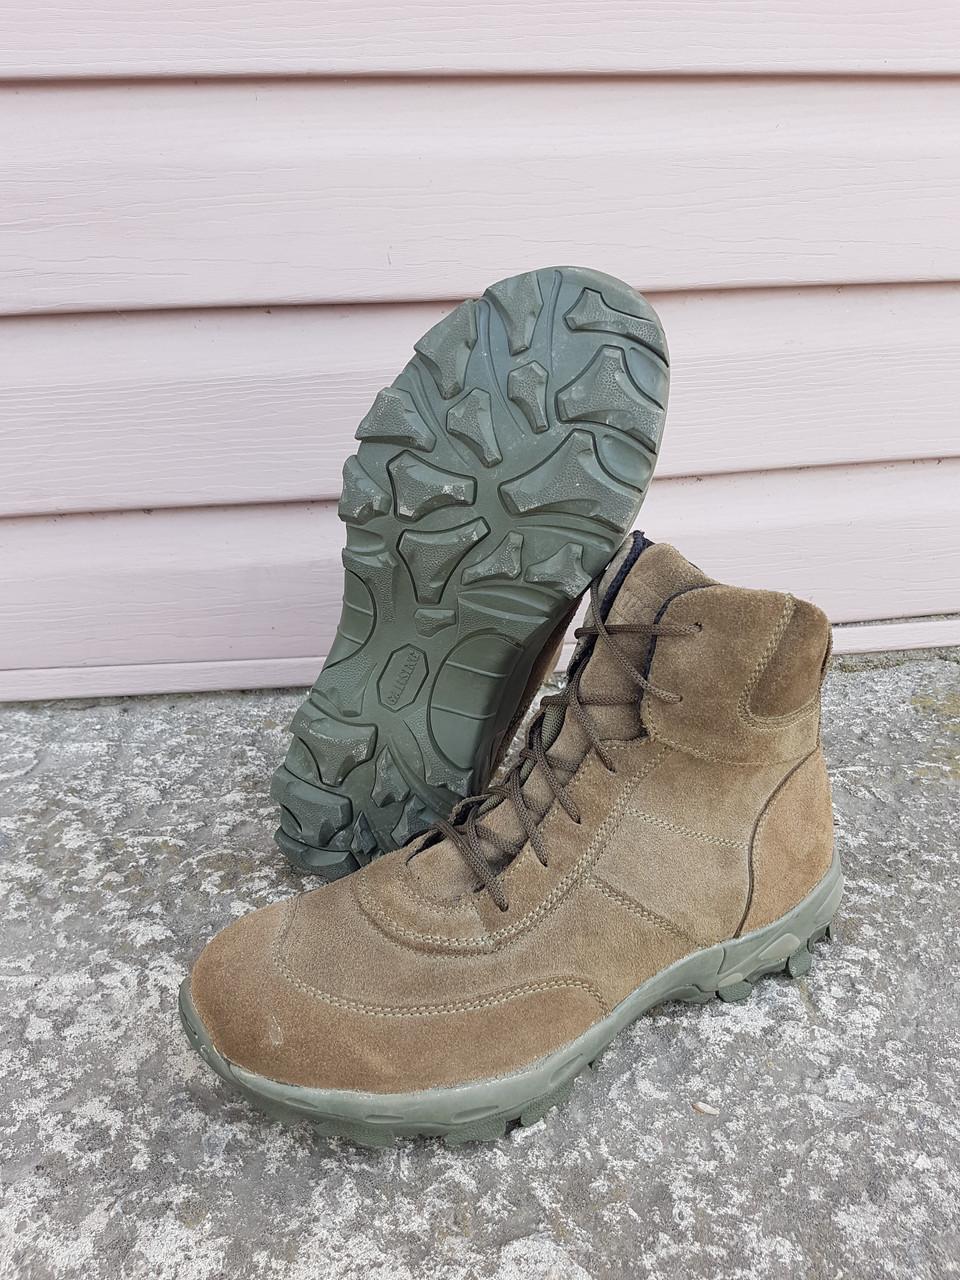 Ботинки Гарсинг (garsing) хаки размеры 42,43